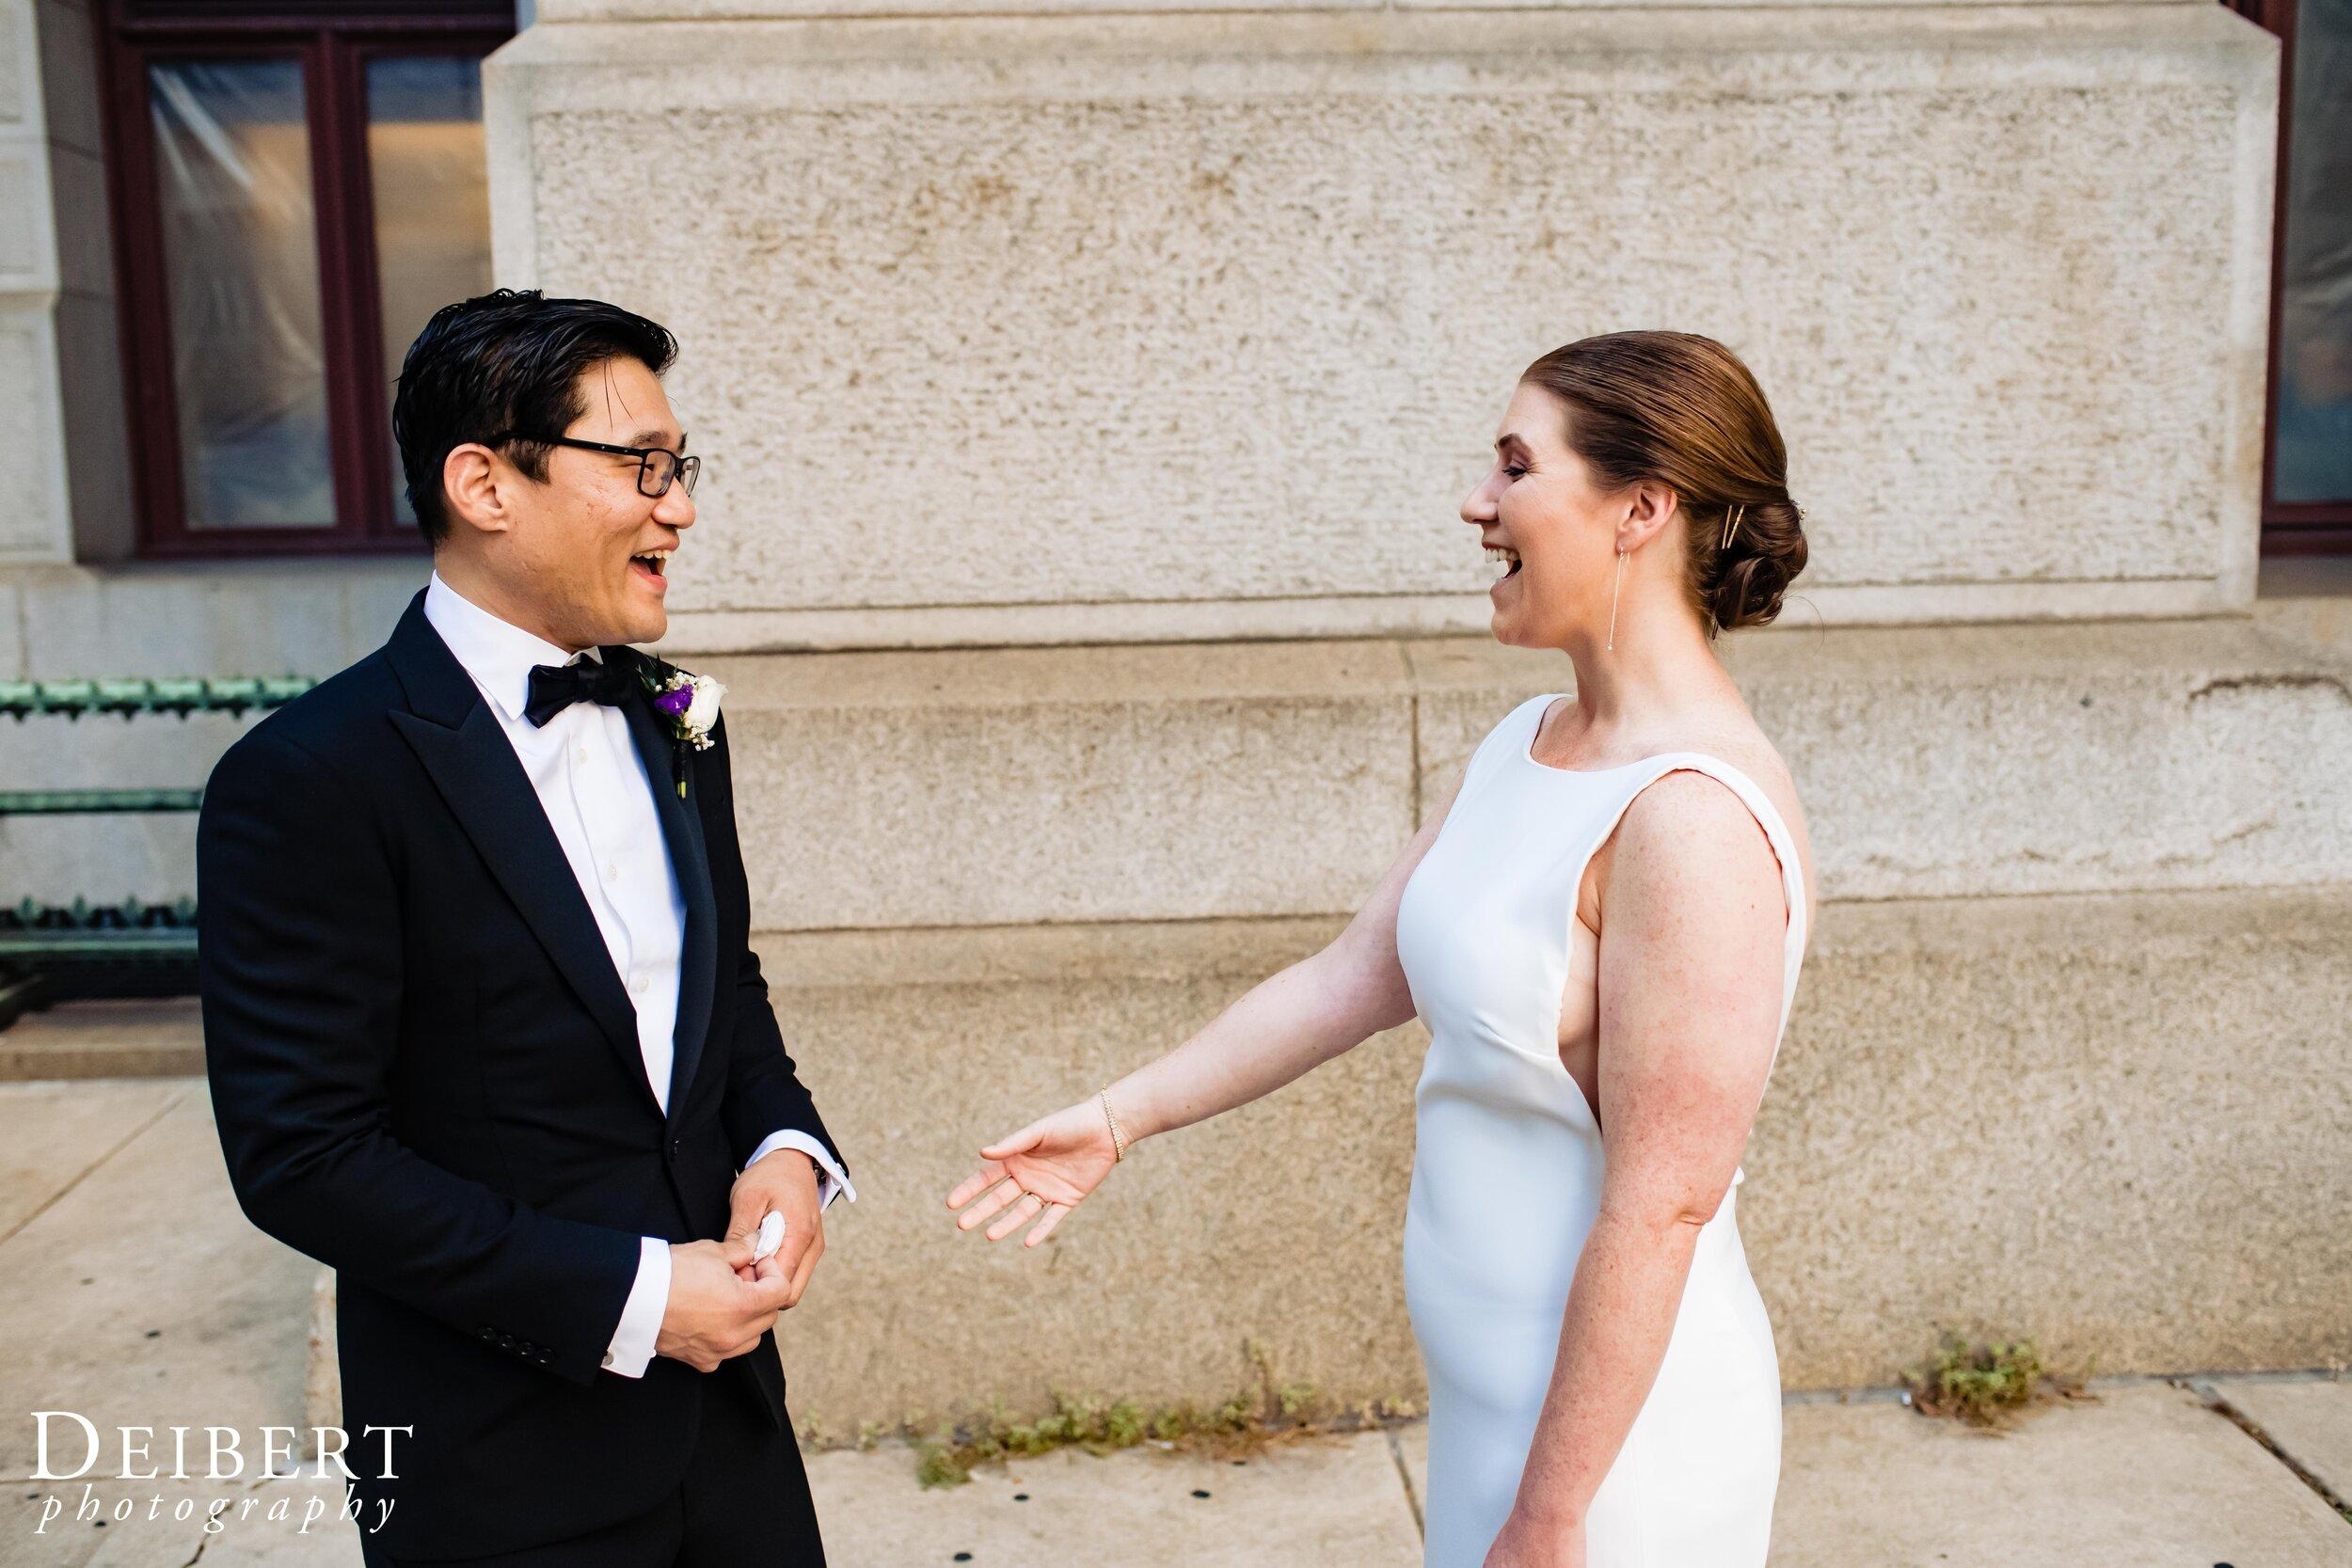 Franklin Institute Philadelpia Wedding-028.JPG